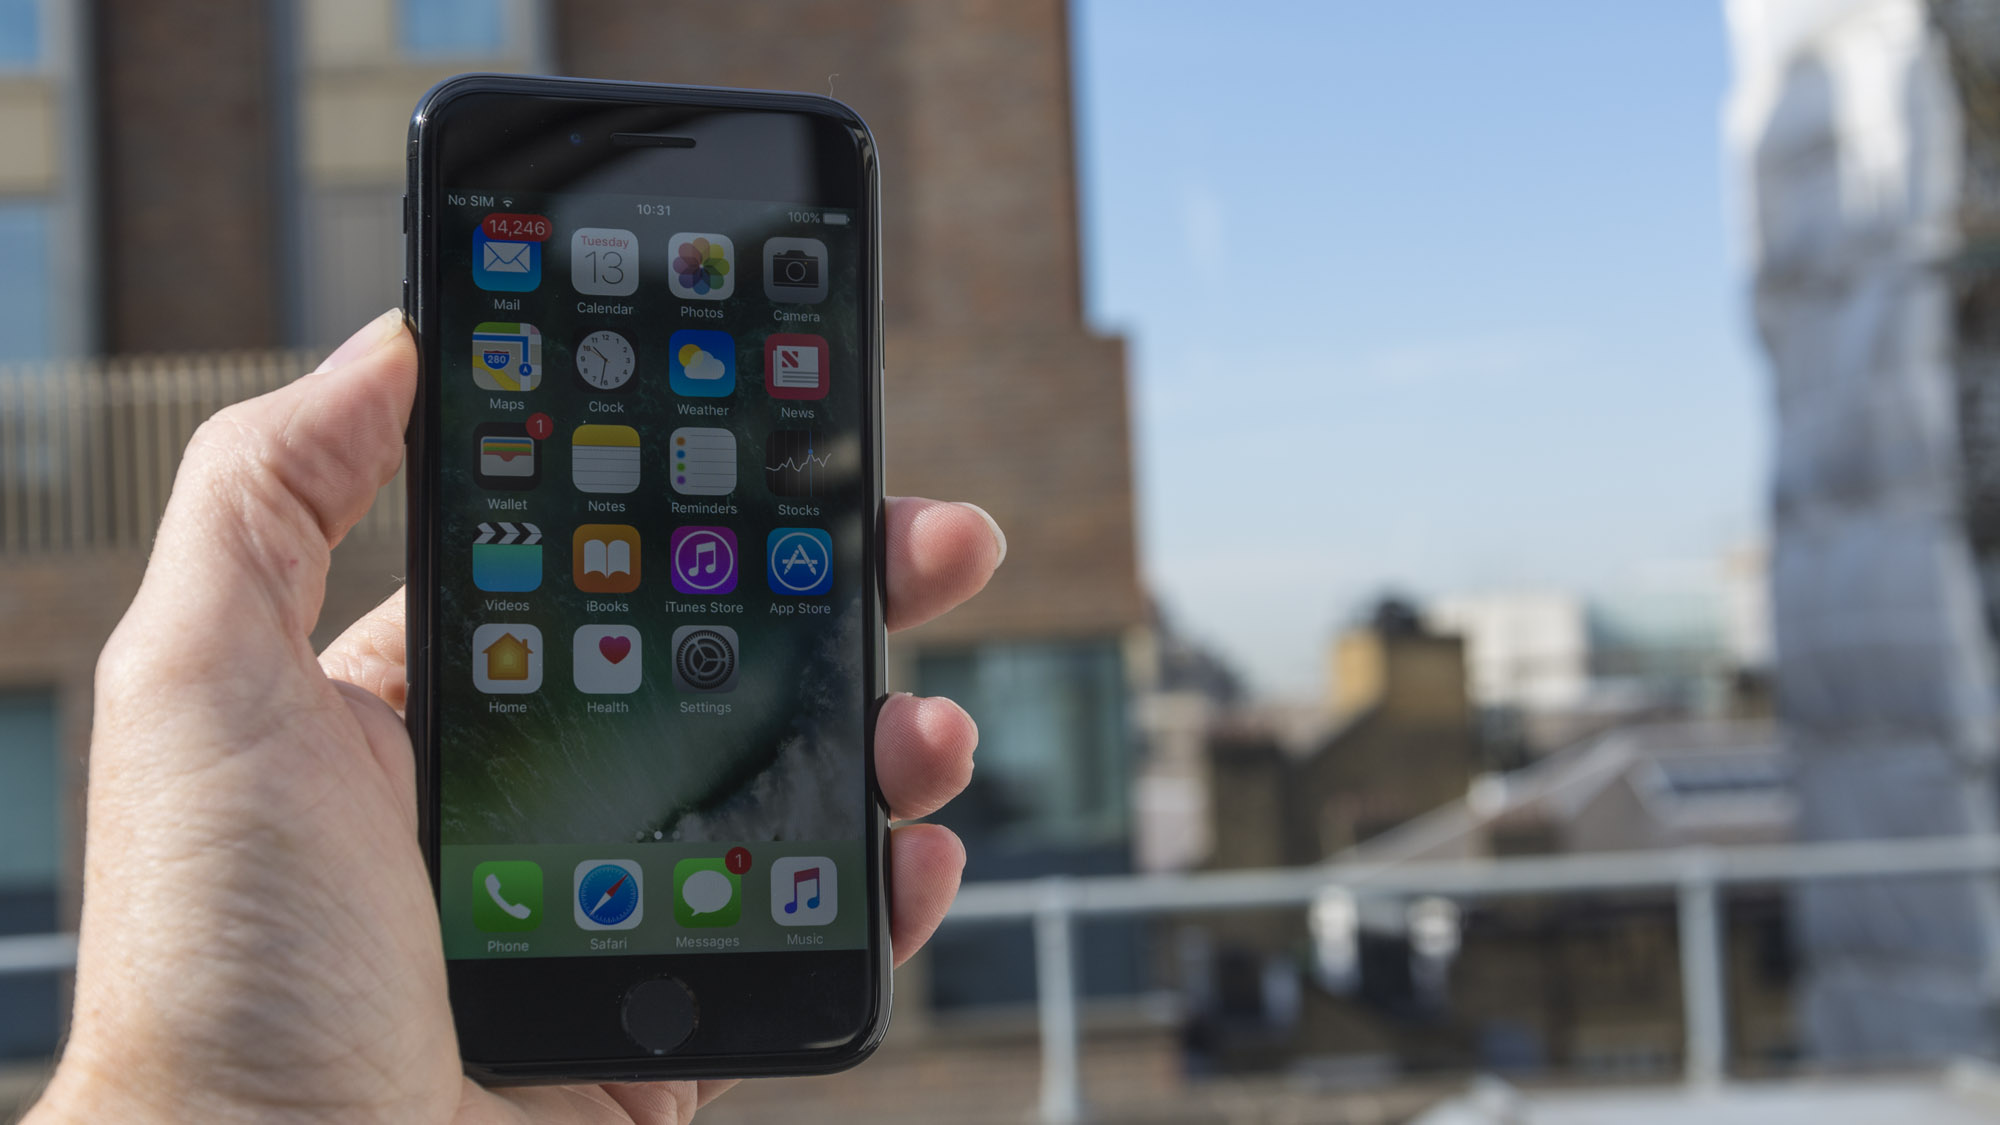 Resettare iPhone senza password